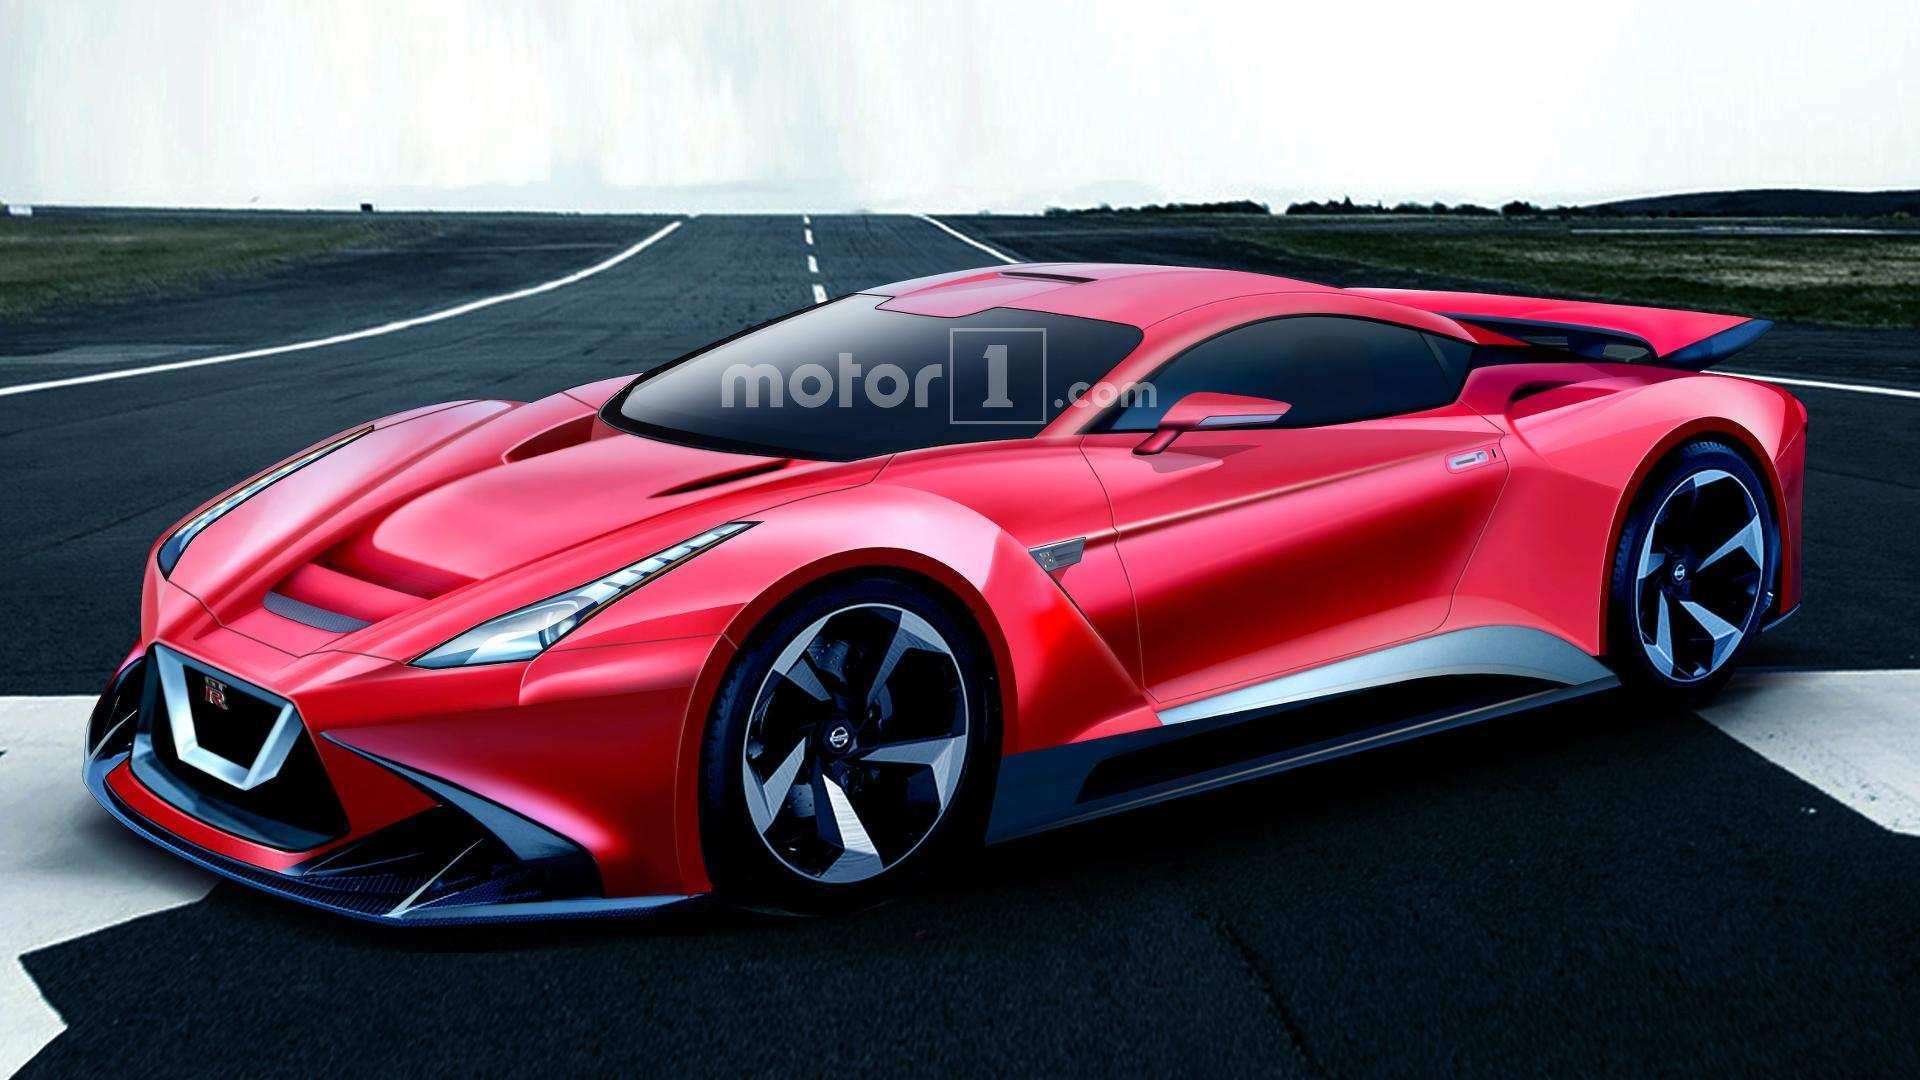 47 New 2020 Nissan Gran Turismo Price by 2020 Nissan Gran Turismo